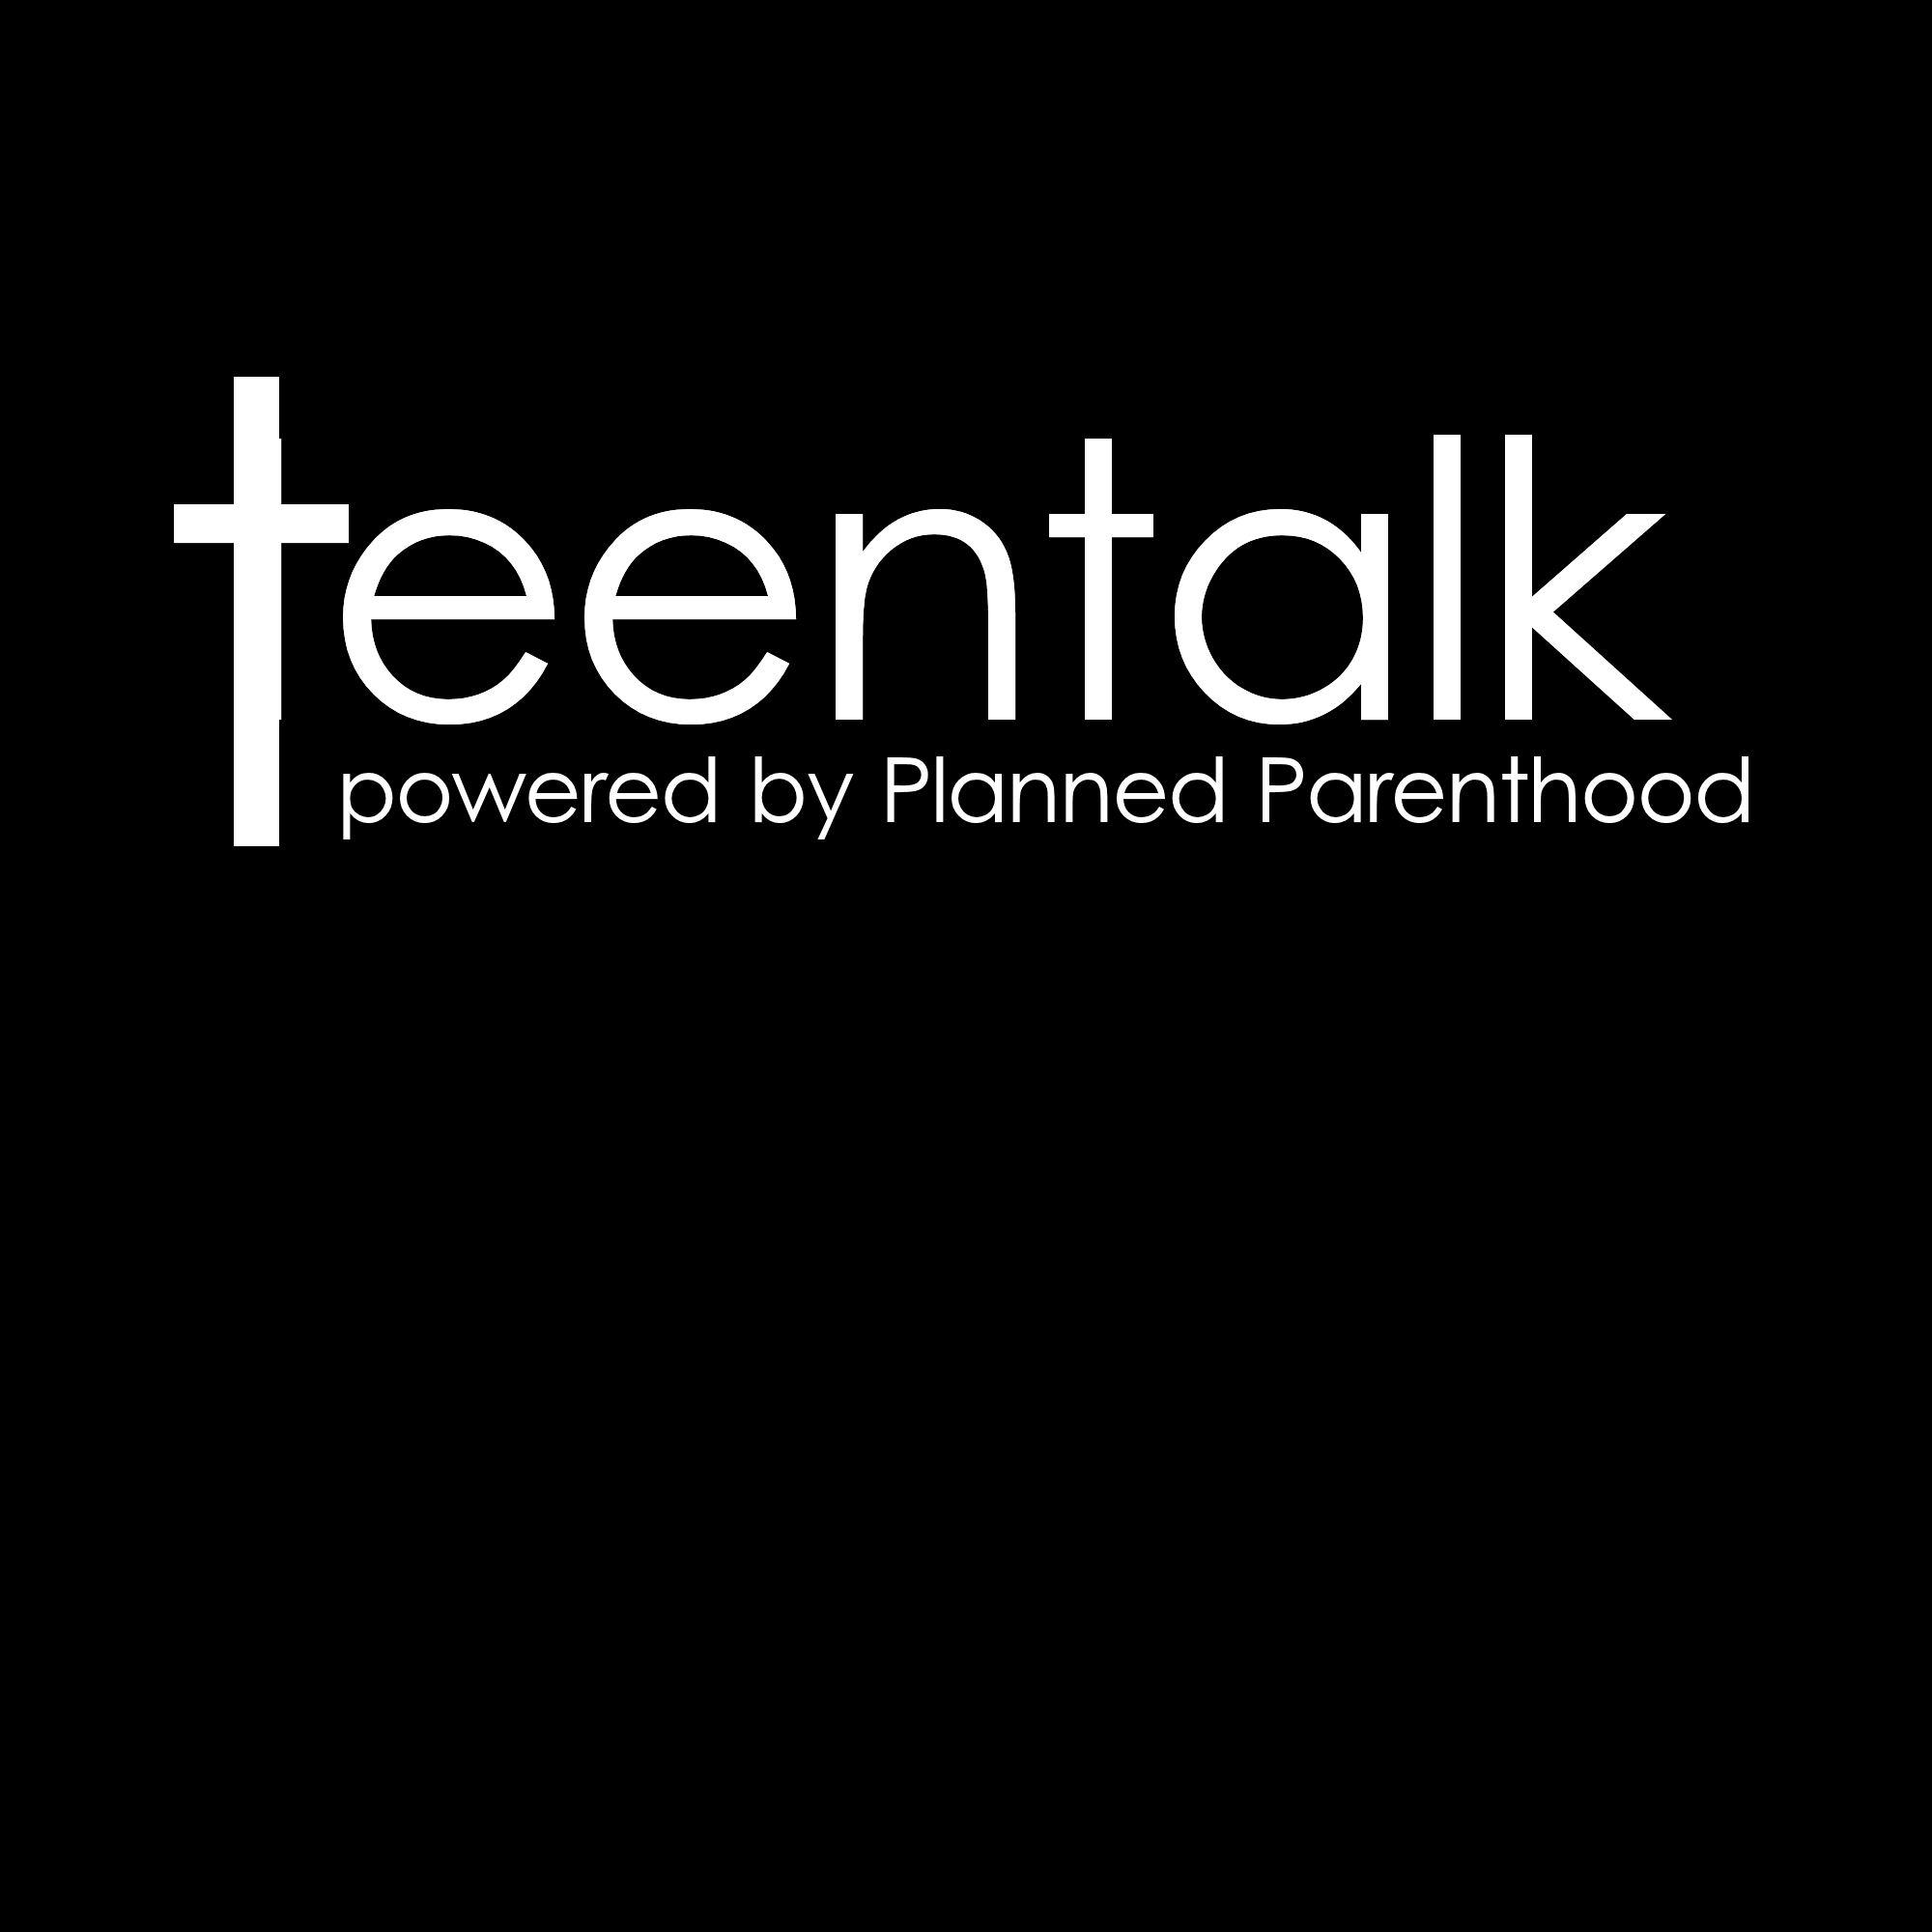 teen talk 00001.jpg